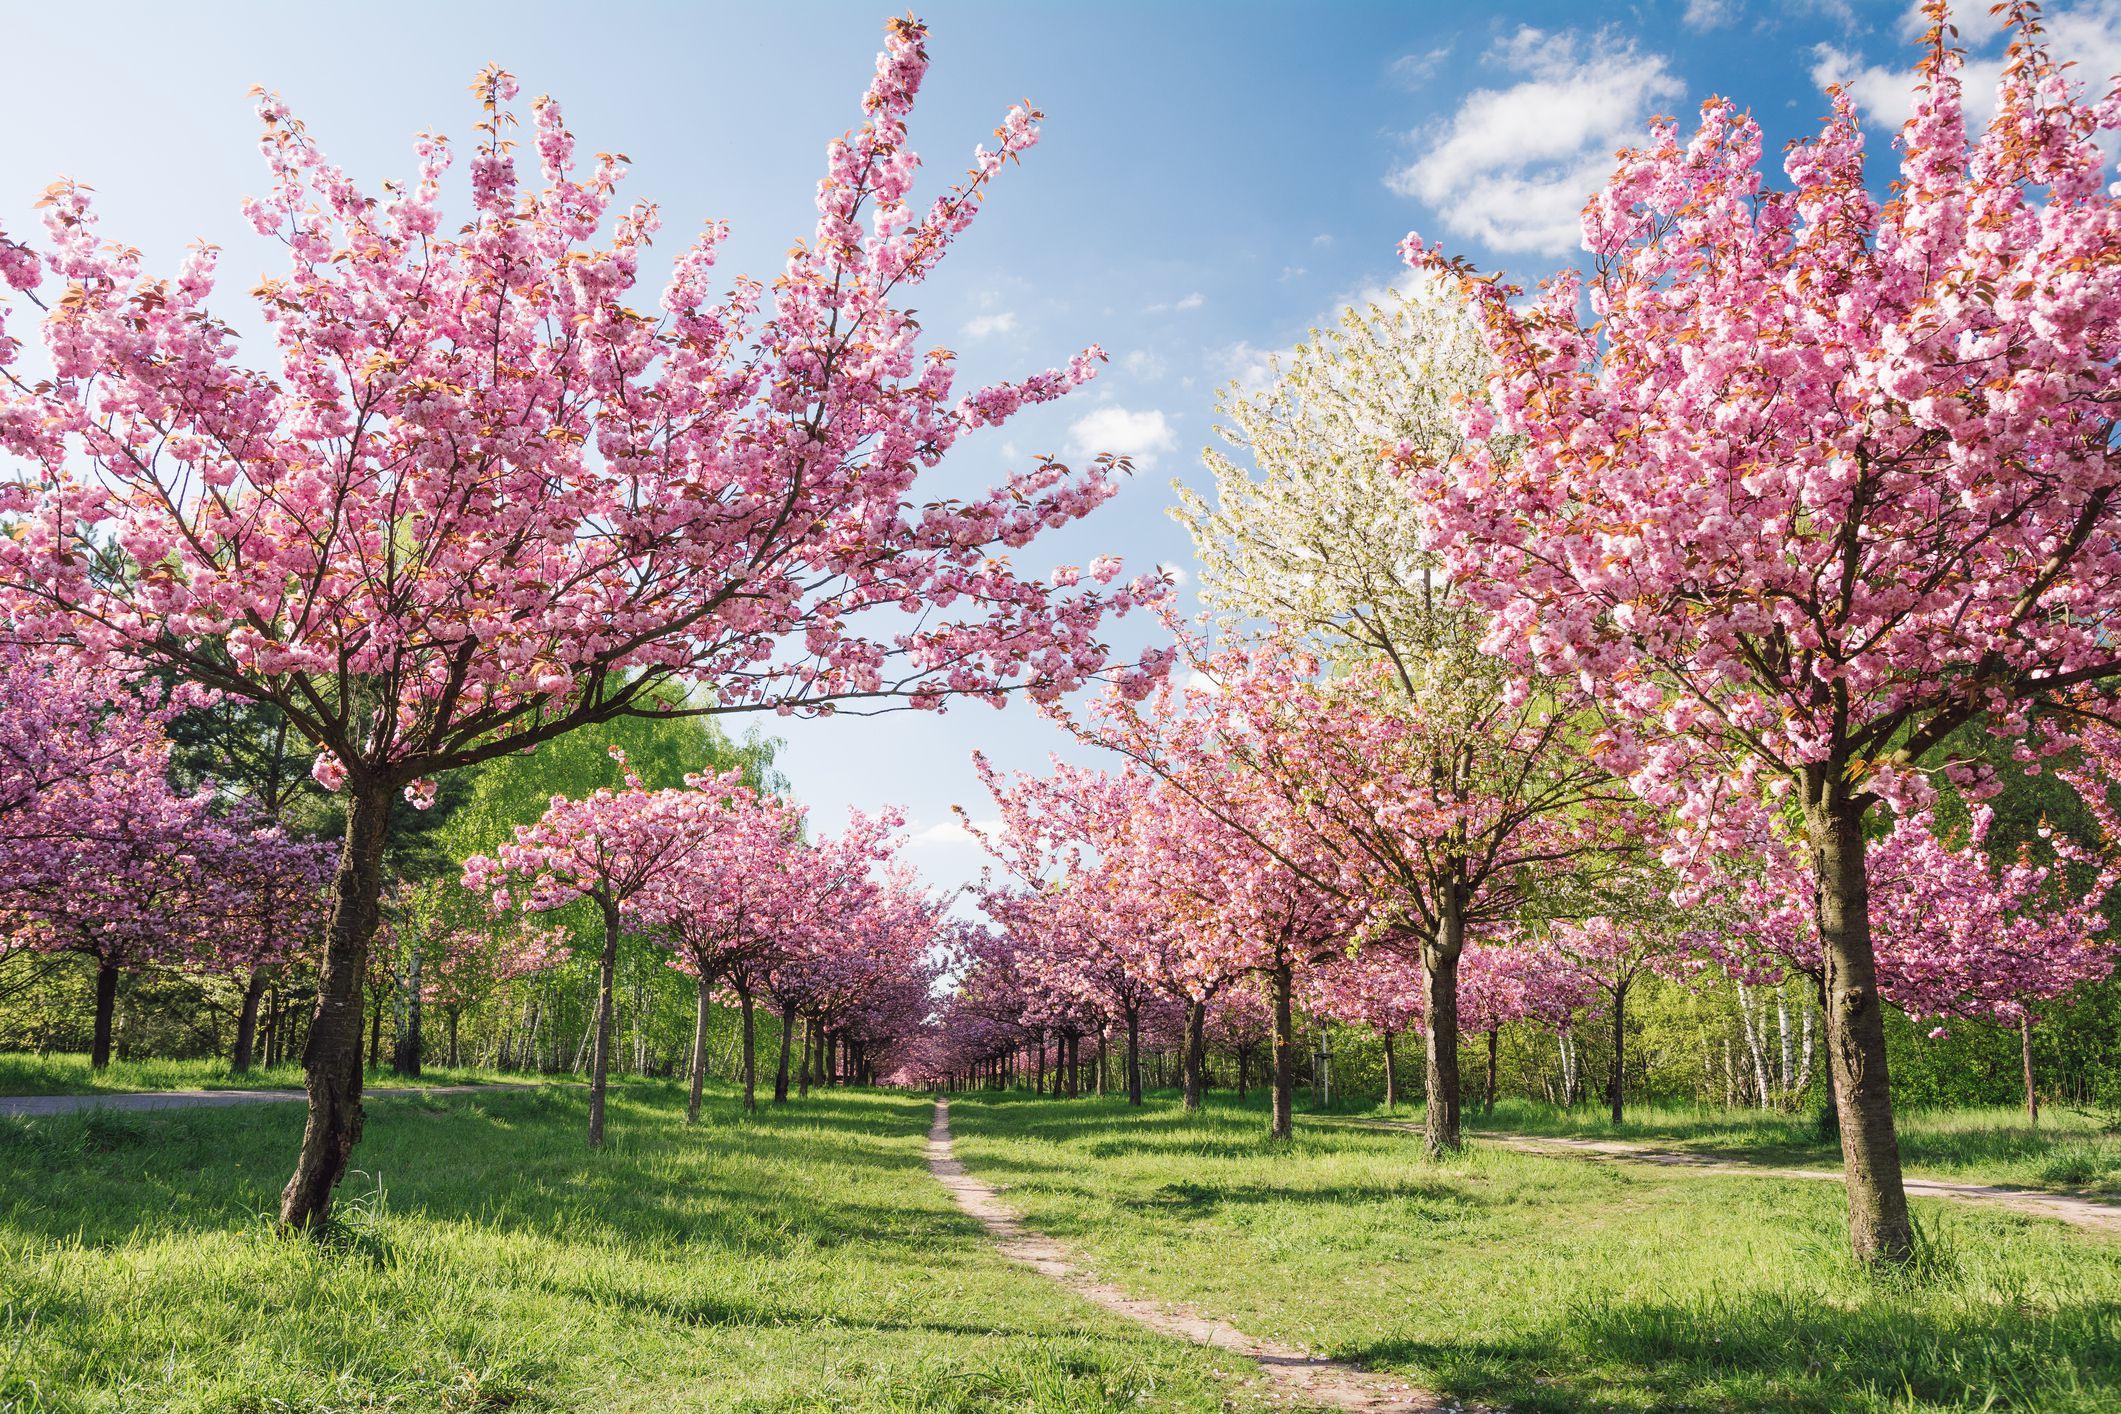 Berlin Cherry Blossom